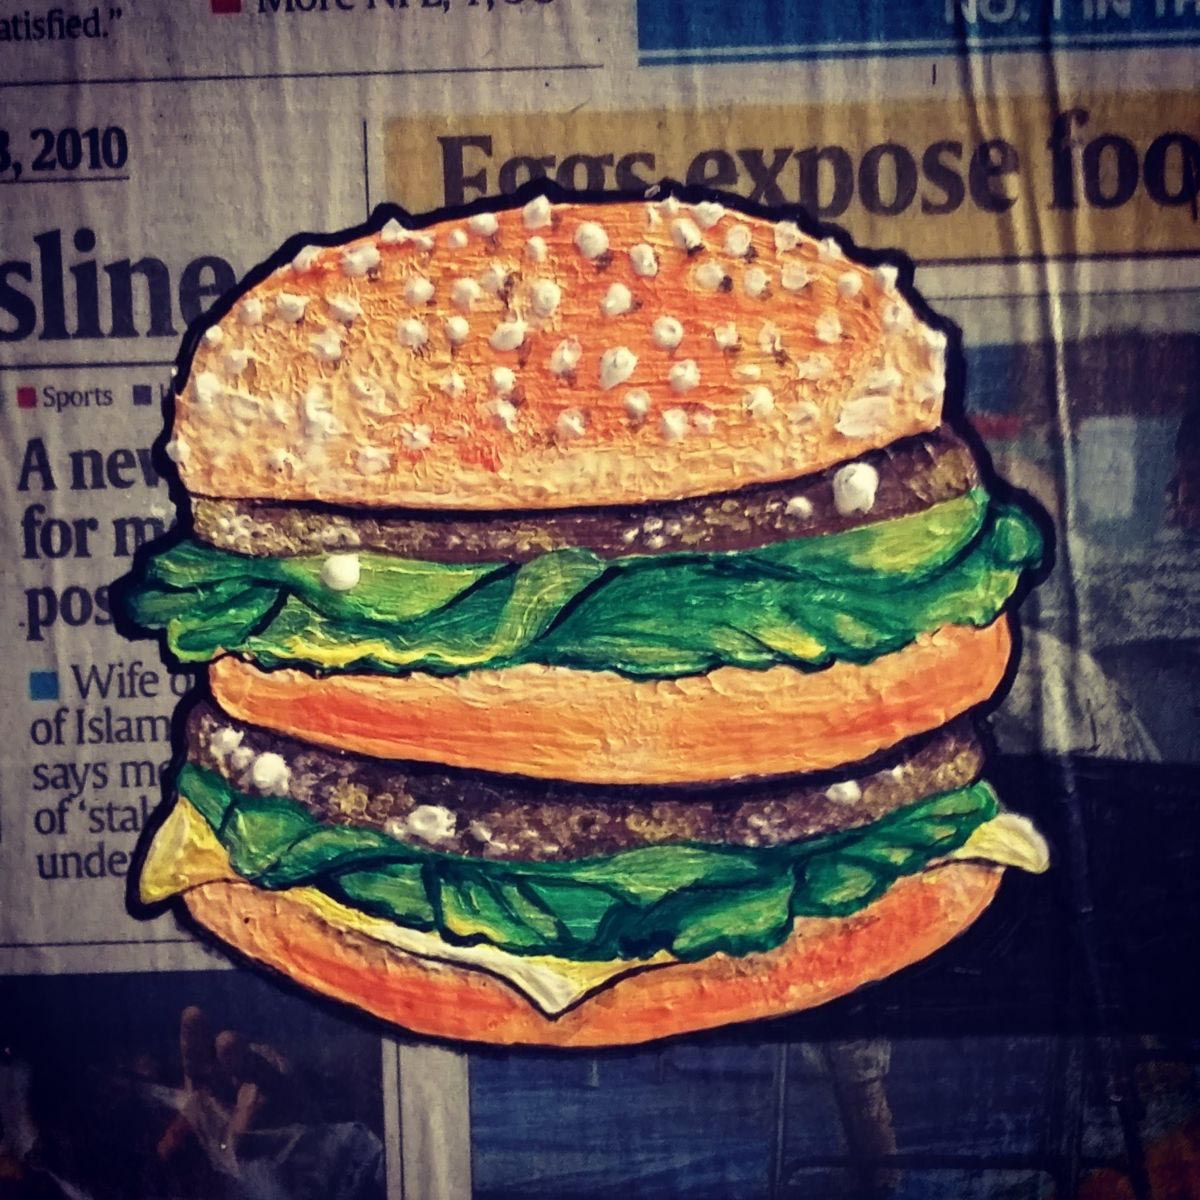 A diplomacia do hambúrguer